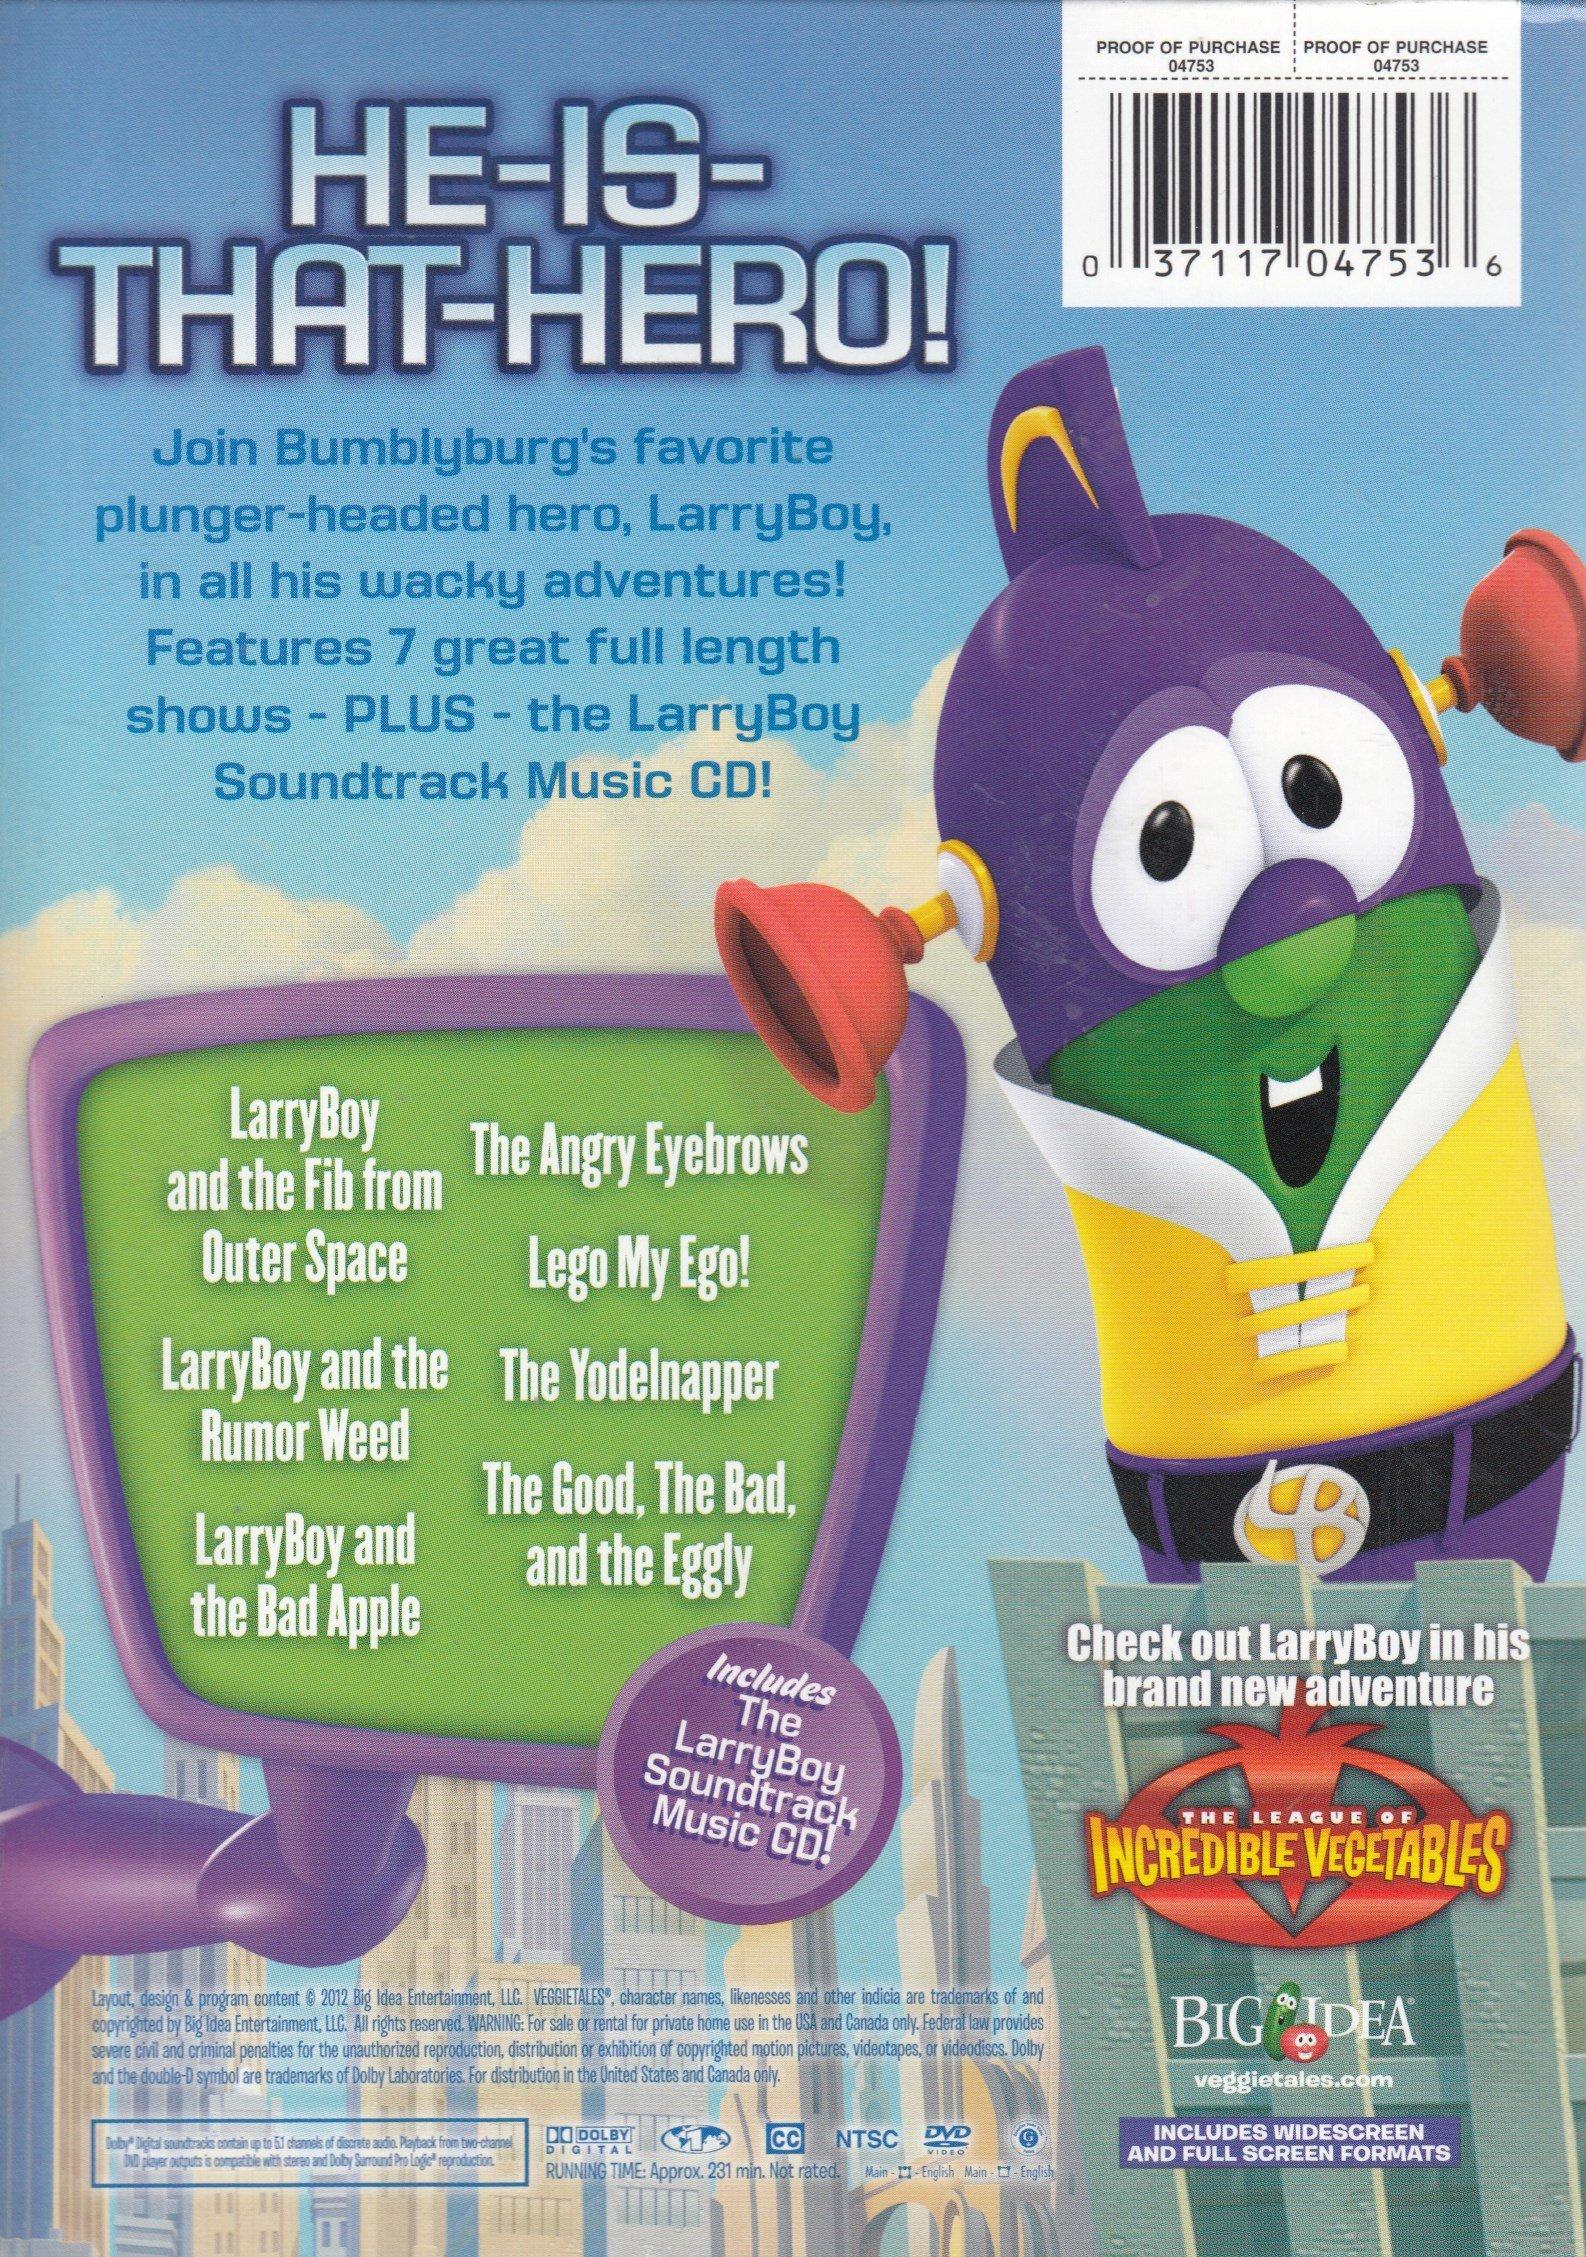 LarryBoy Superhero Power Pack